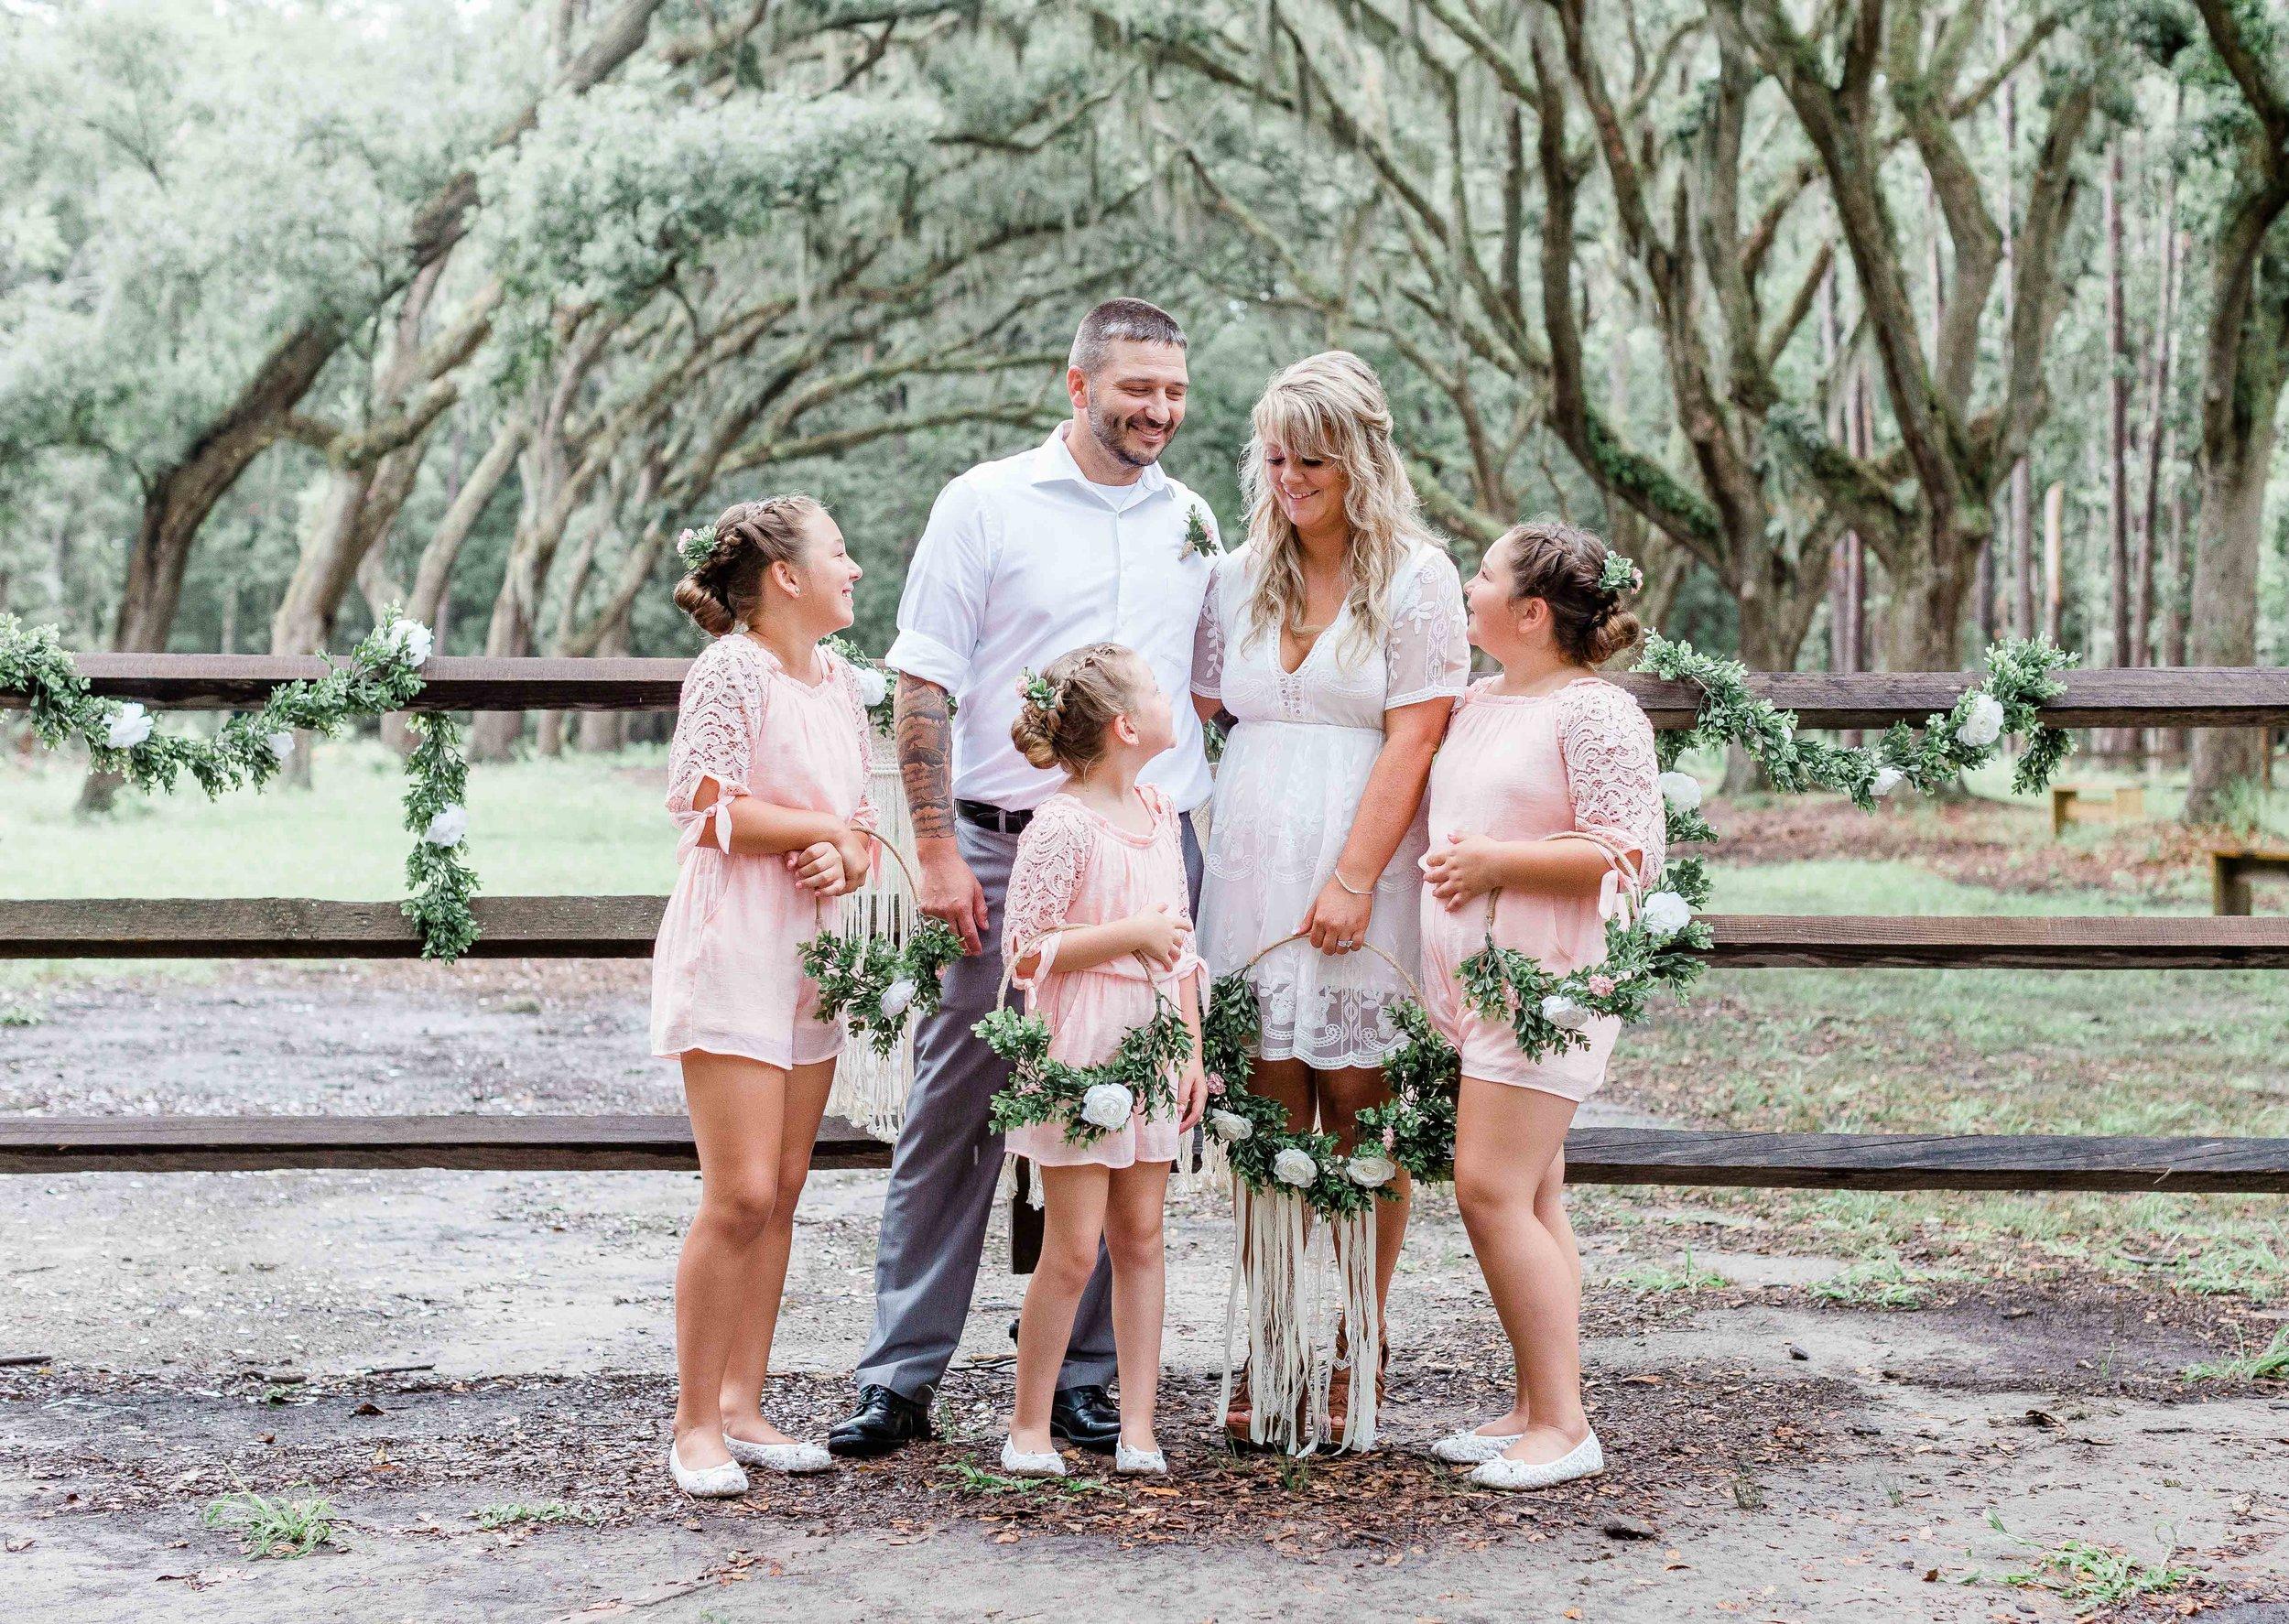 20190727Georgia-Wormlsoe Plantation-Simply Eloped-Savannah Wedding Photographer- Southern Lens Photography06.jpg